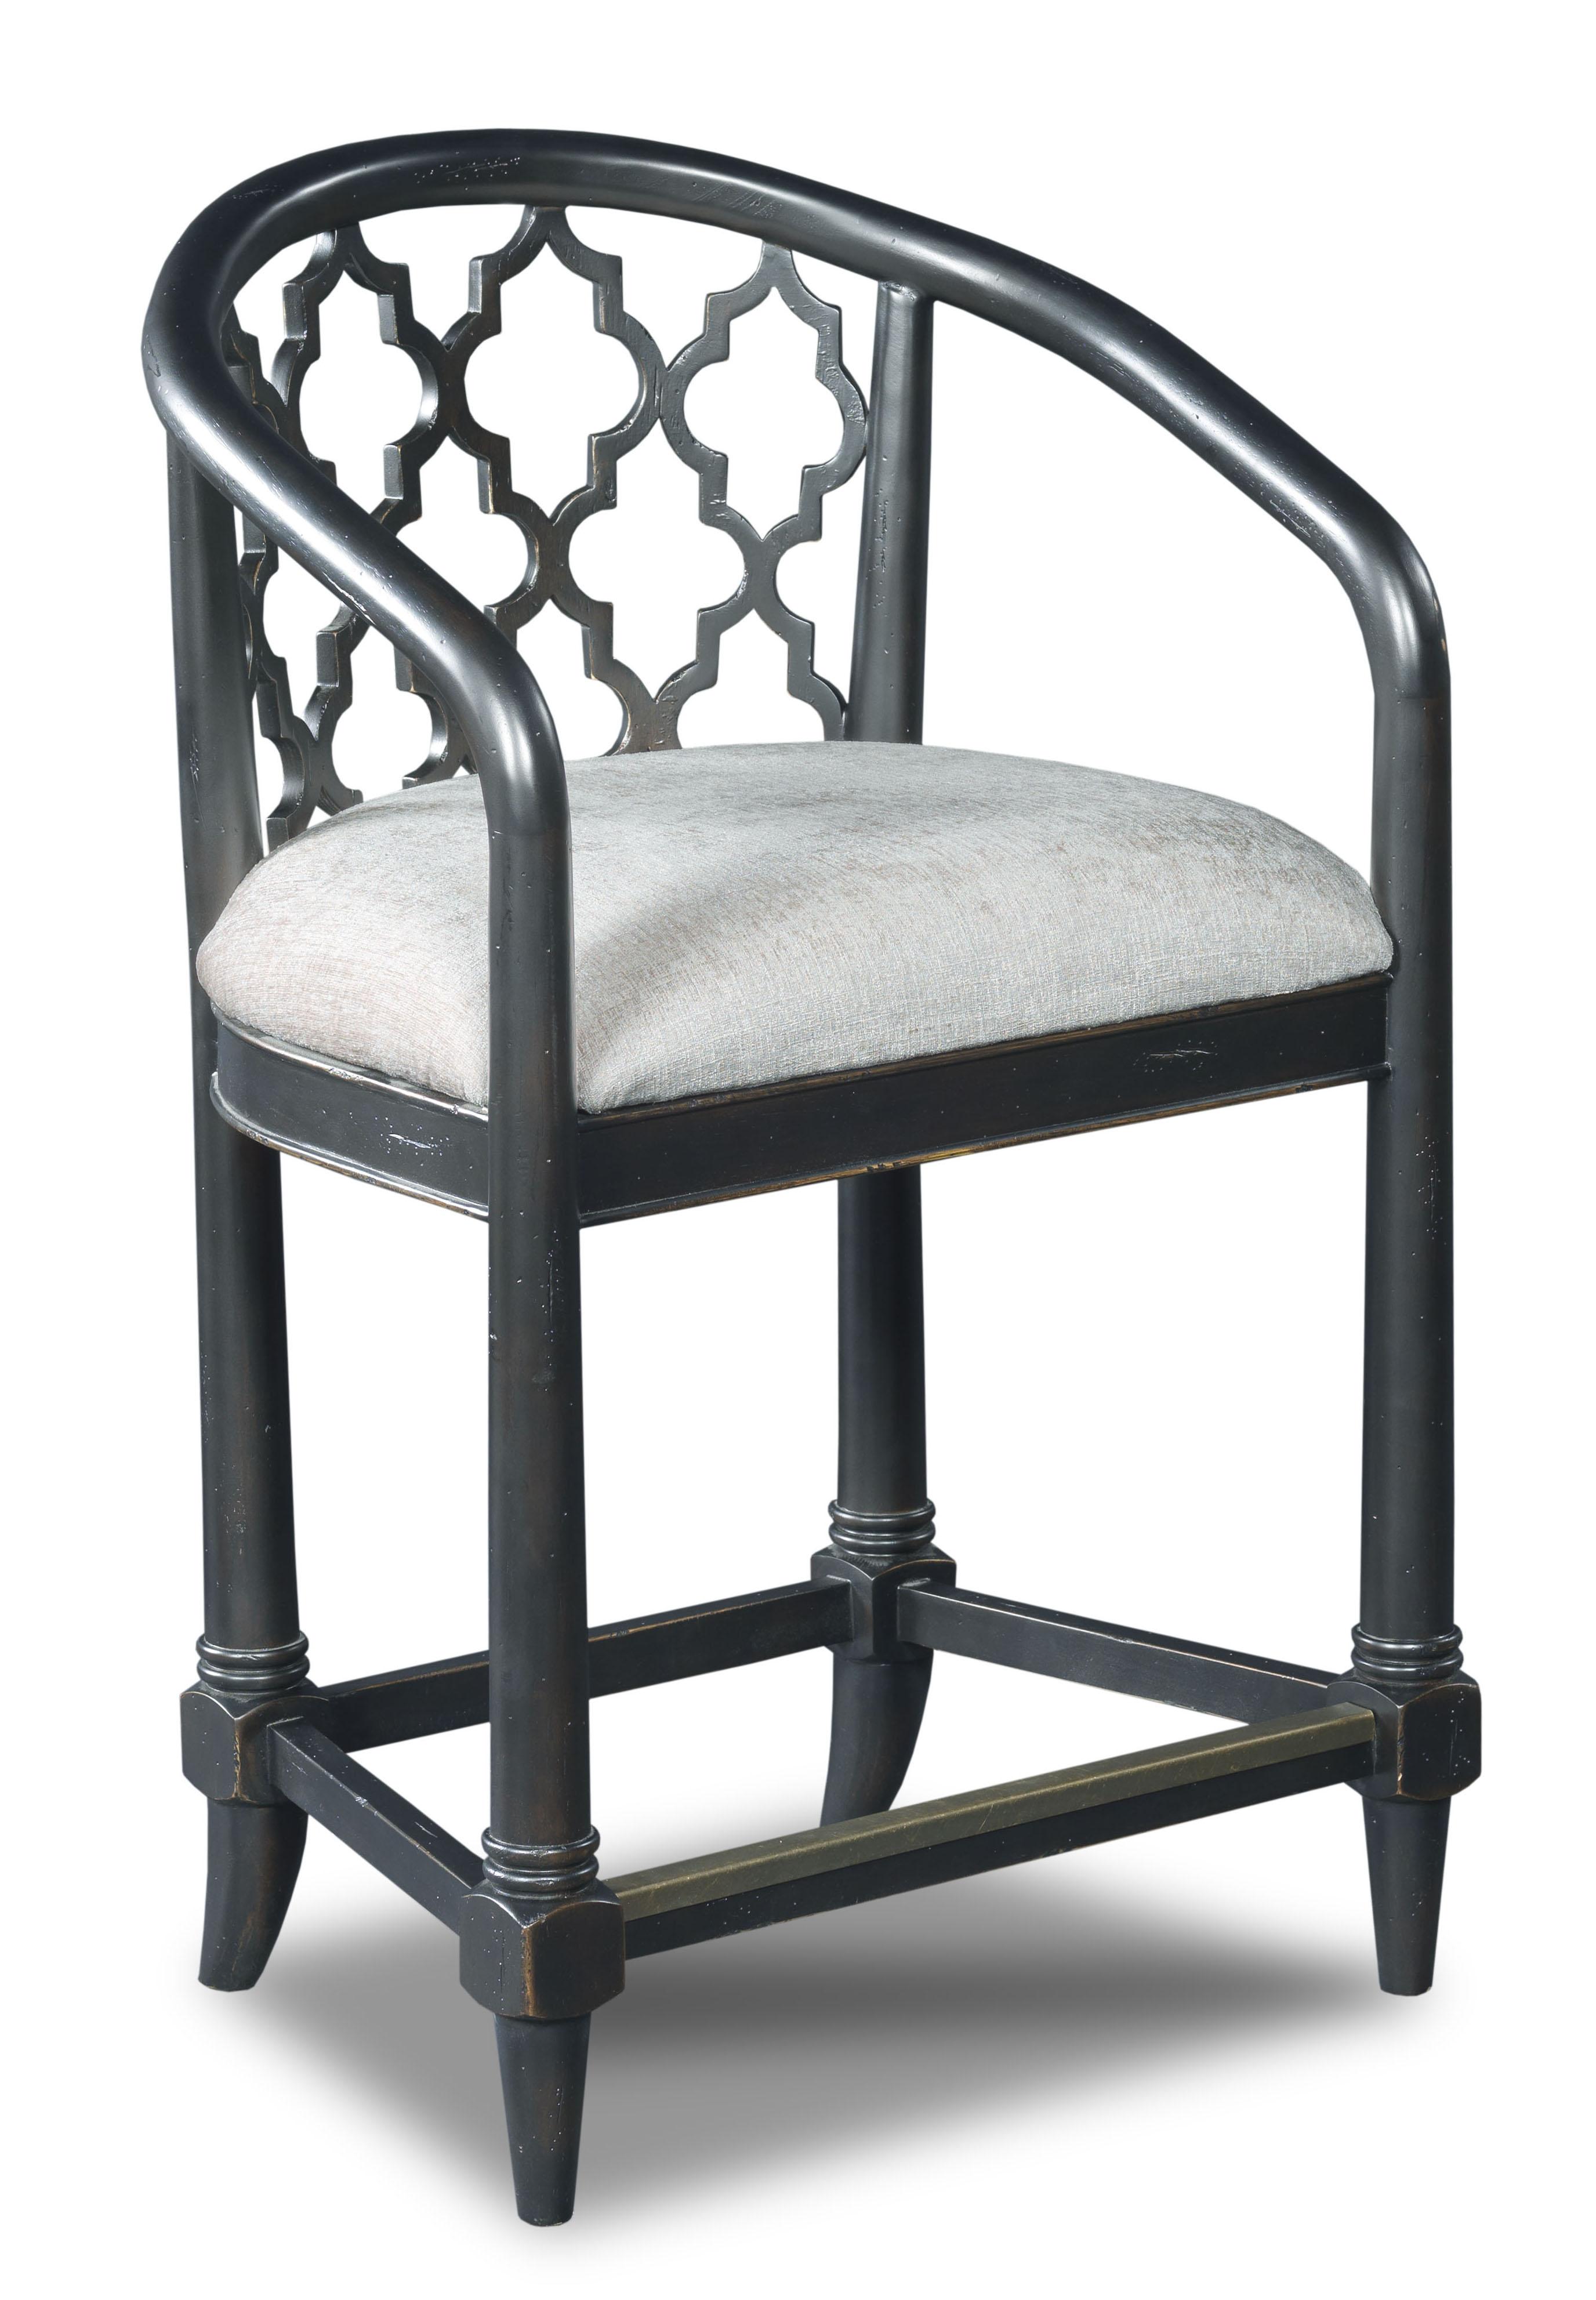 Hooker Furniture Stools Dark Cosmopolitan Geometric Counter Stool - Item Number: 300-25011